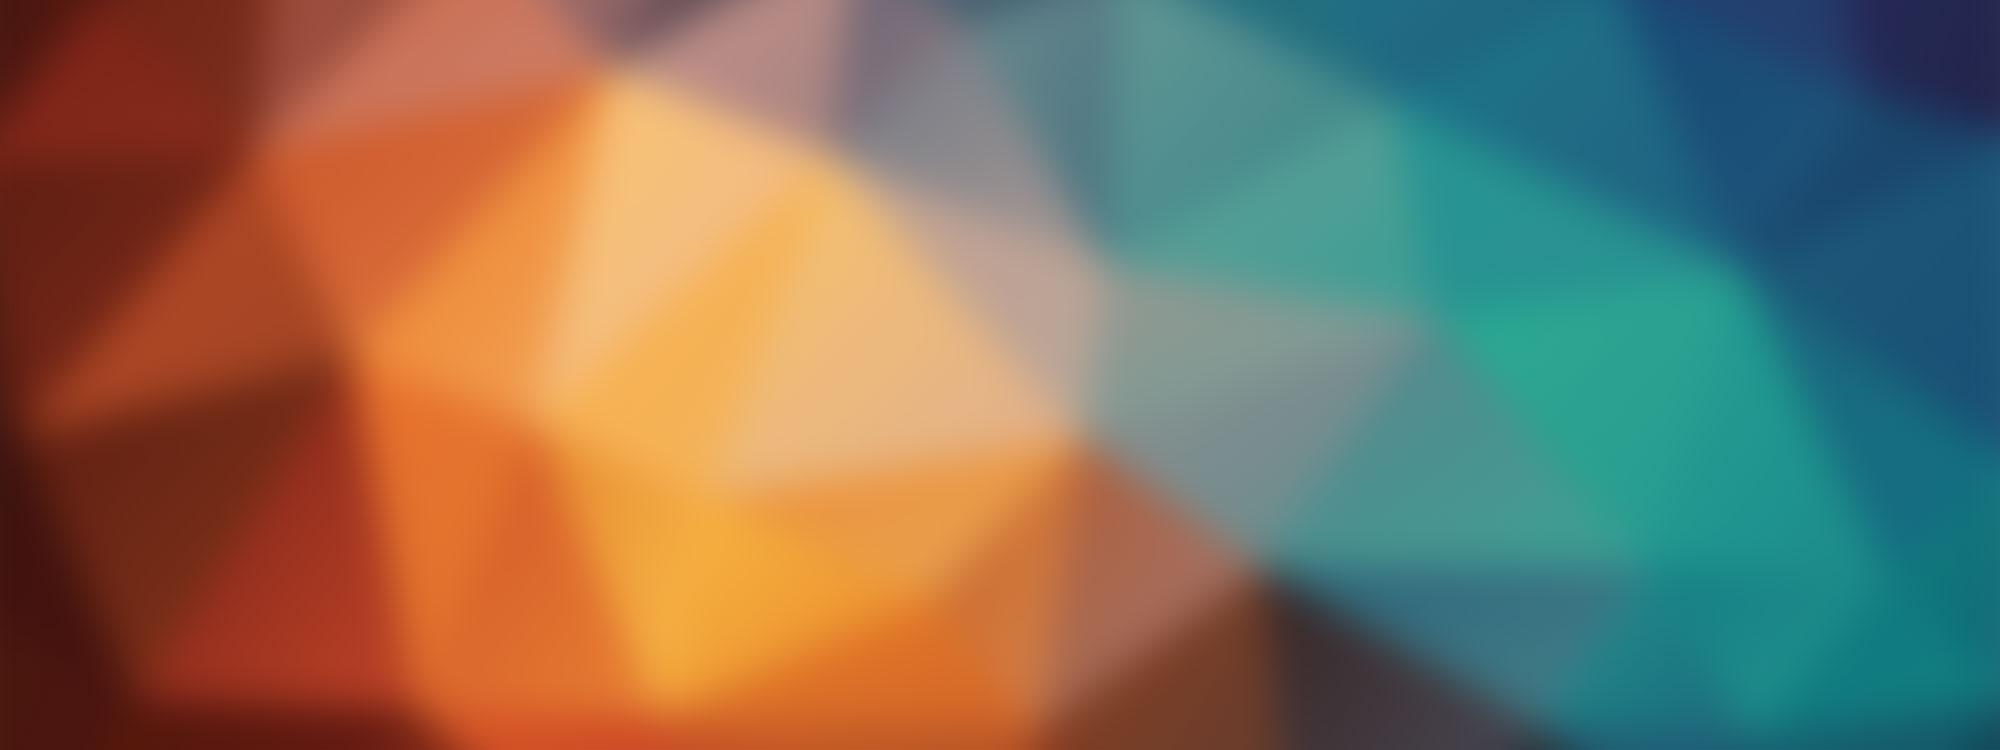 Blur_Background_November_2017_03